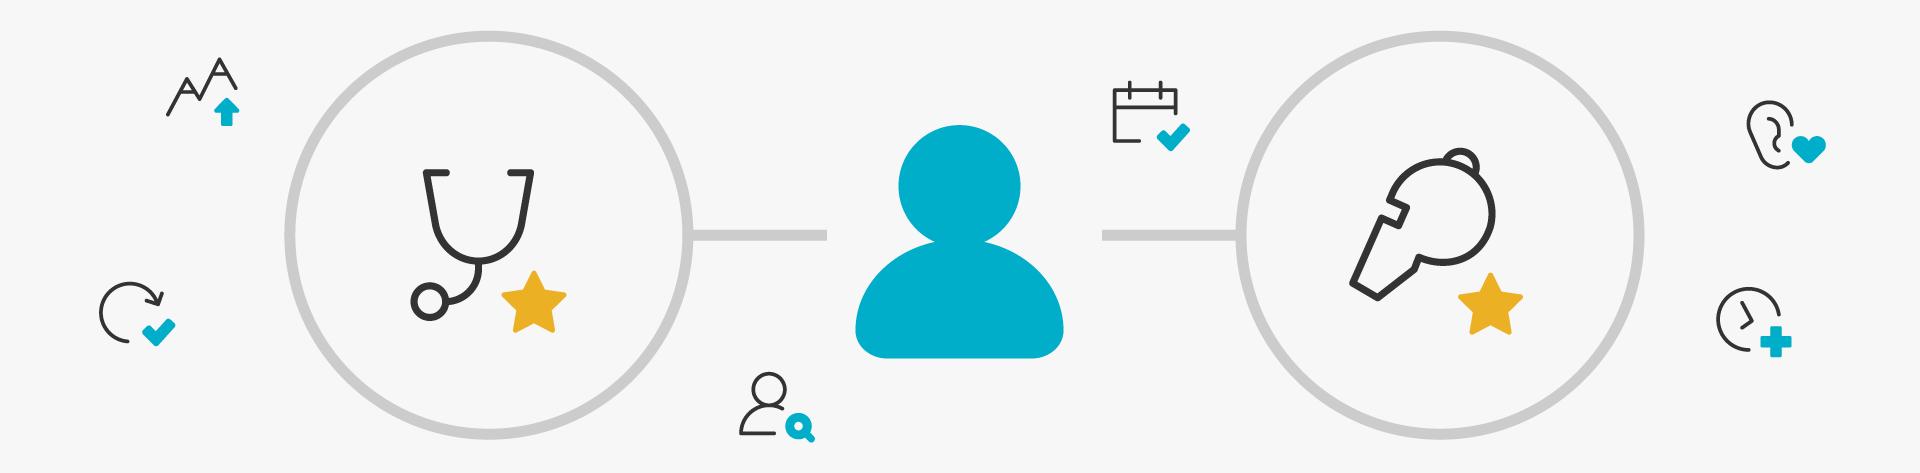 vera_wide-illustration_apc-integrated-provider-patient-coach